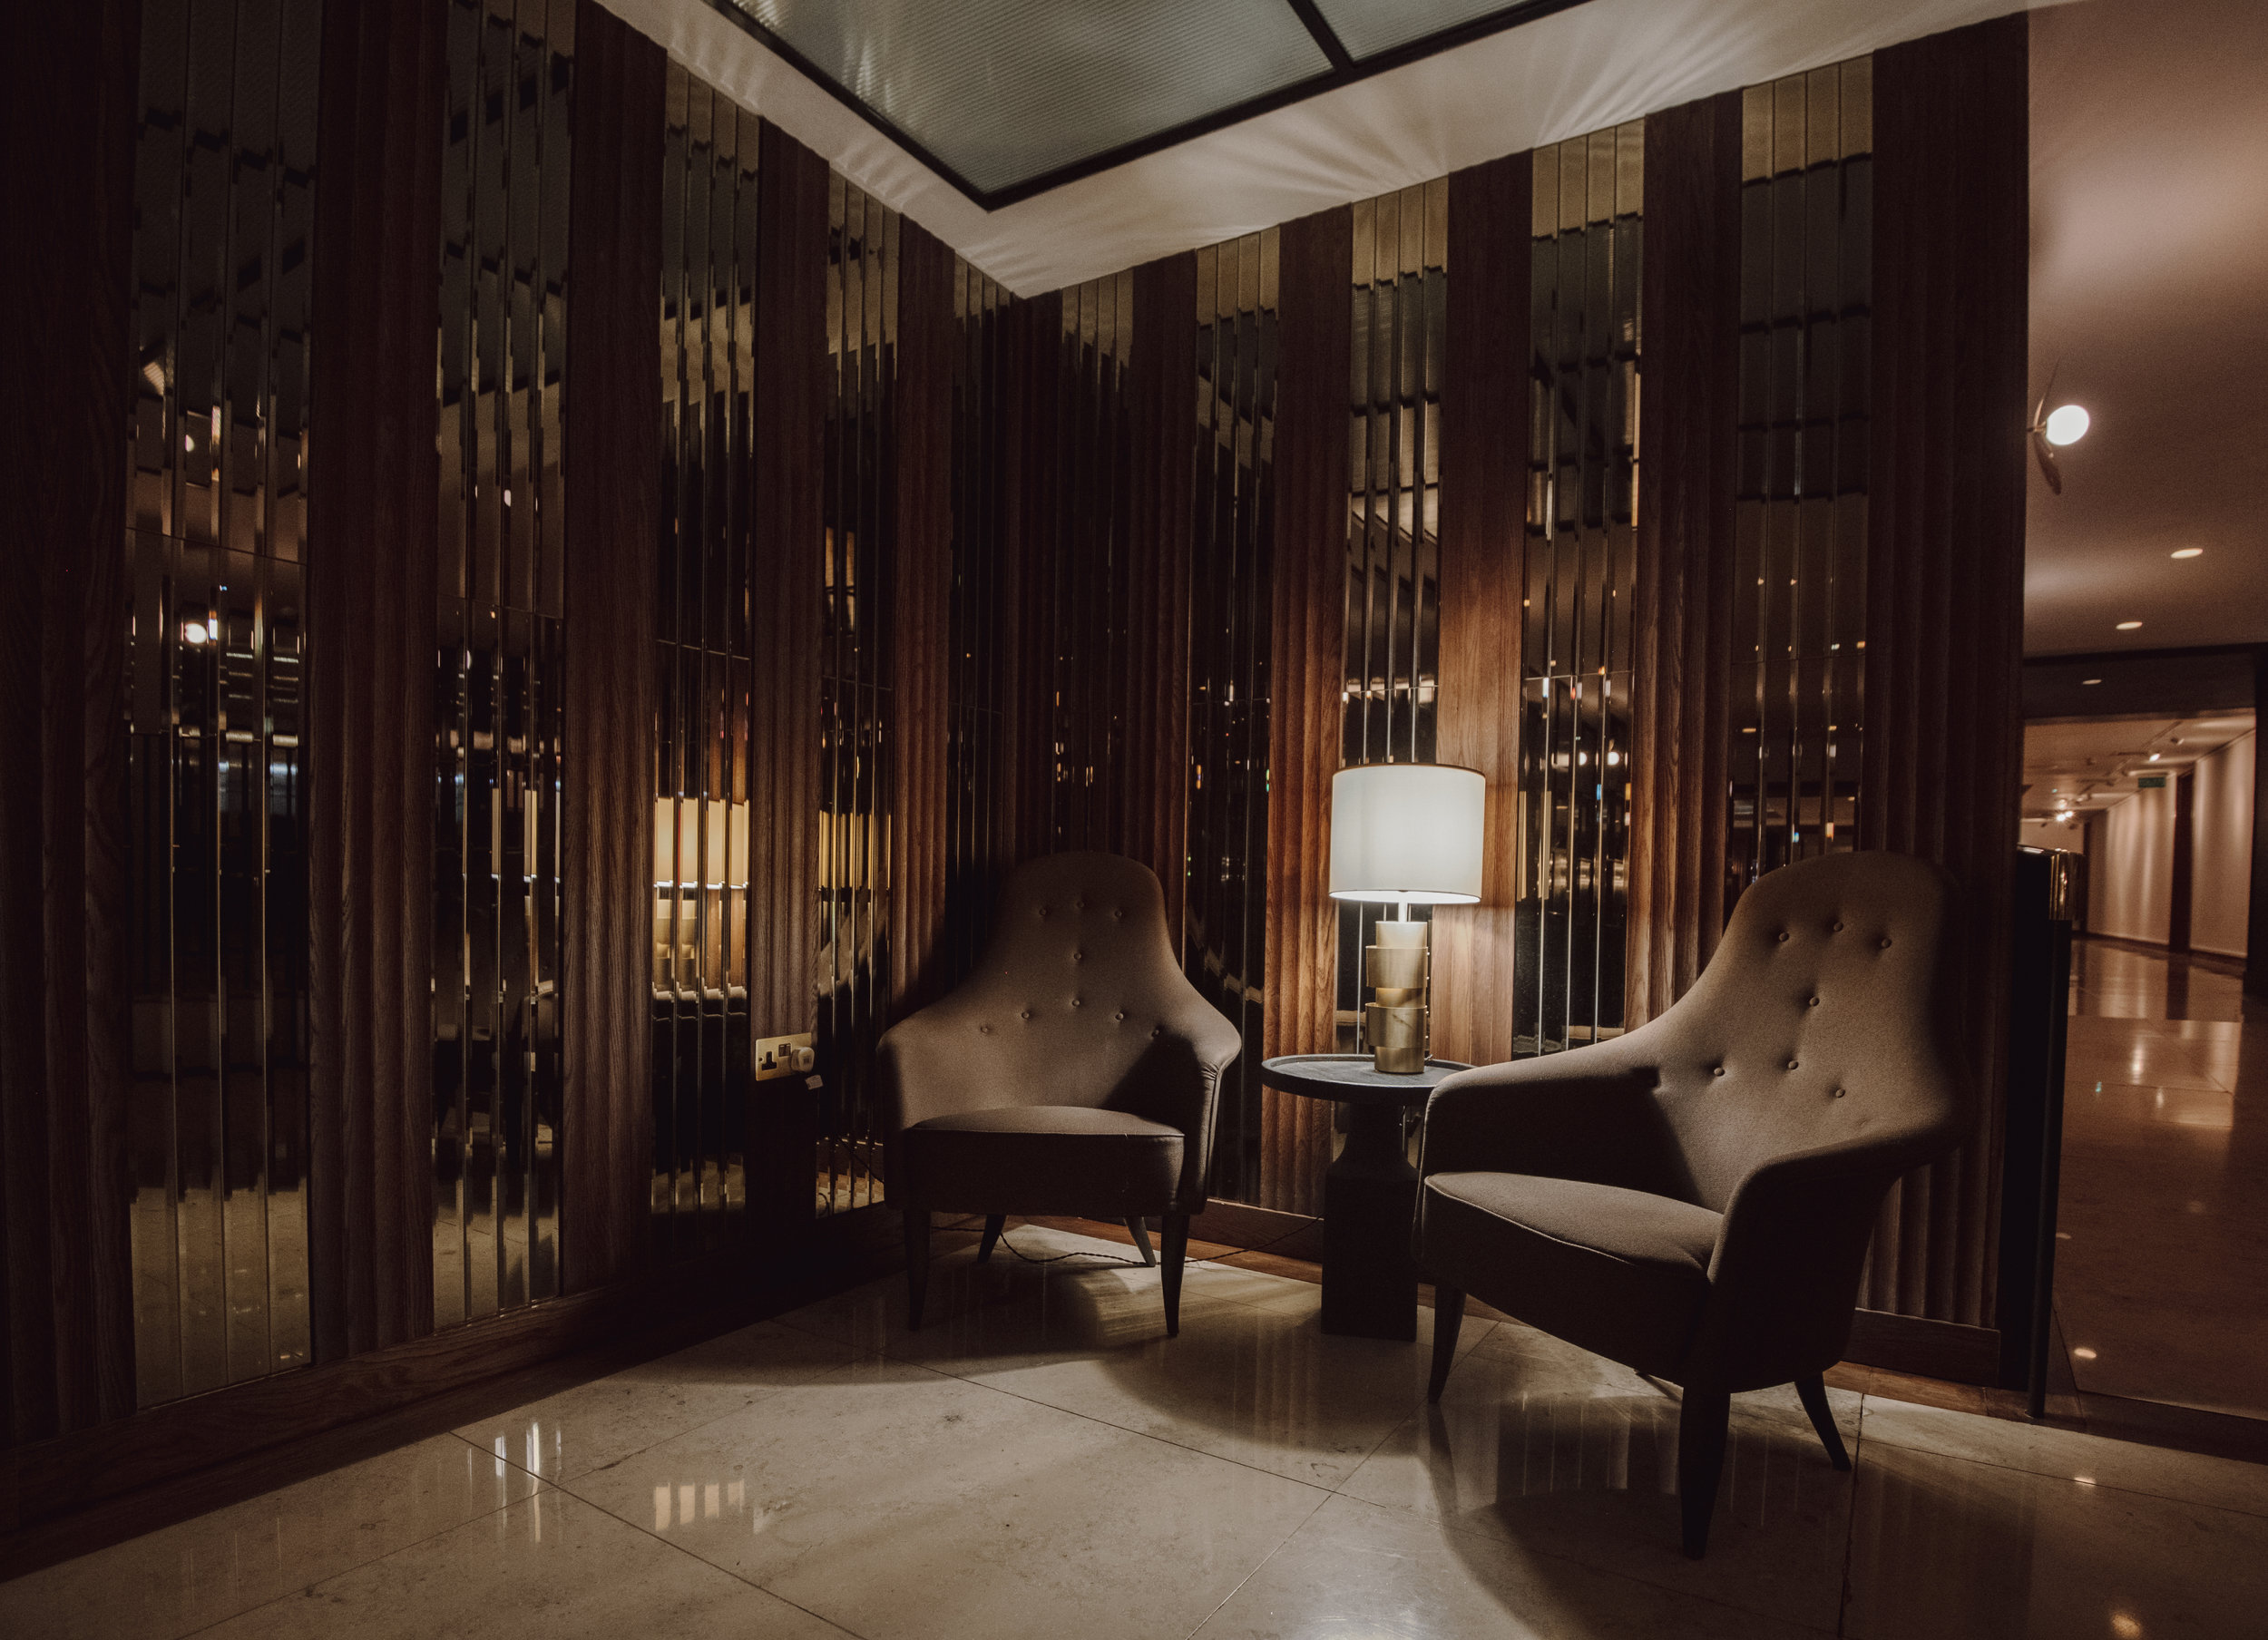 Hotel Marylebone | Nicole Bissey Photography 06.JPG